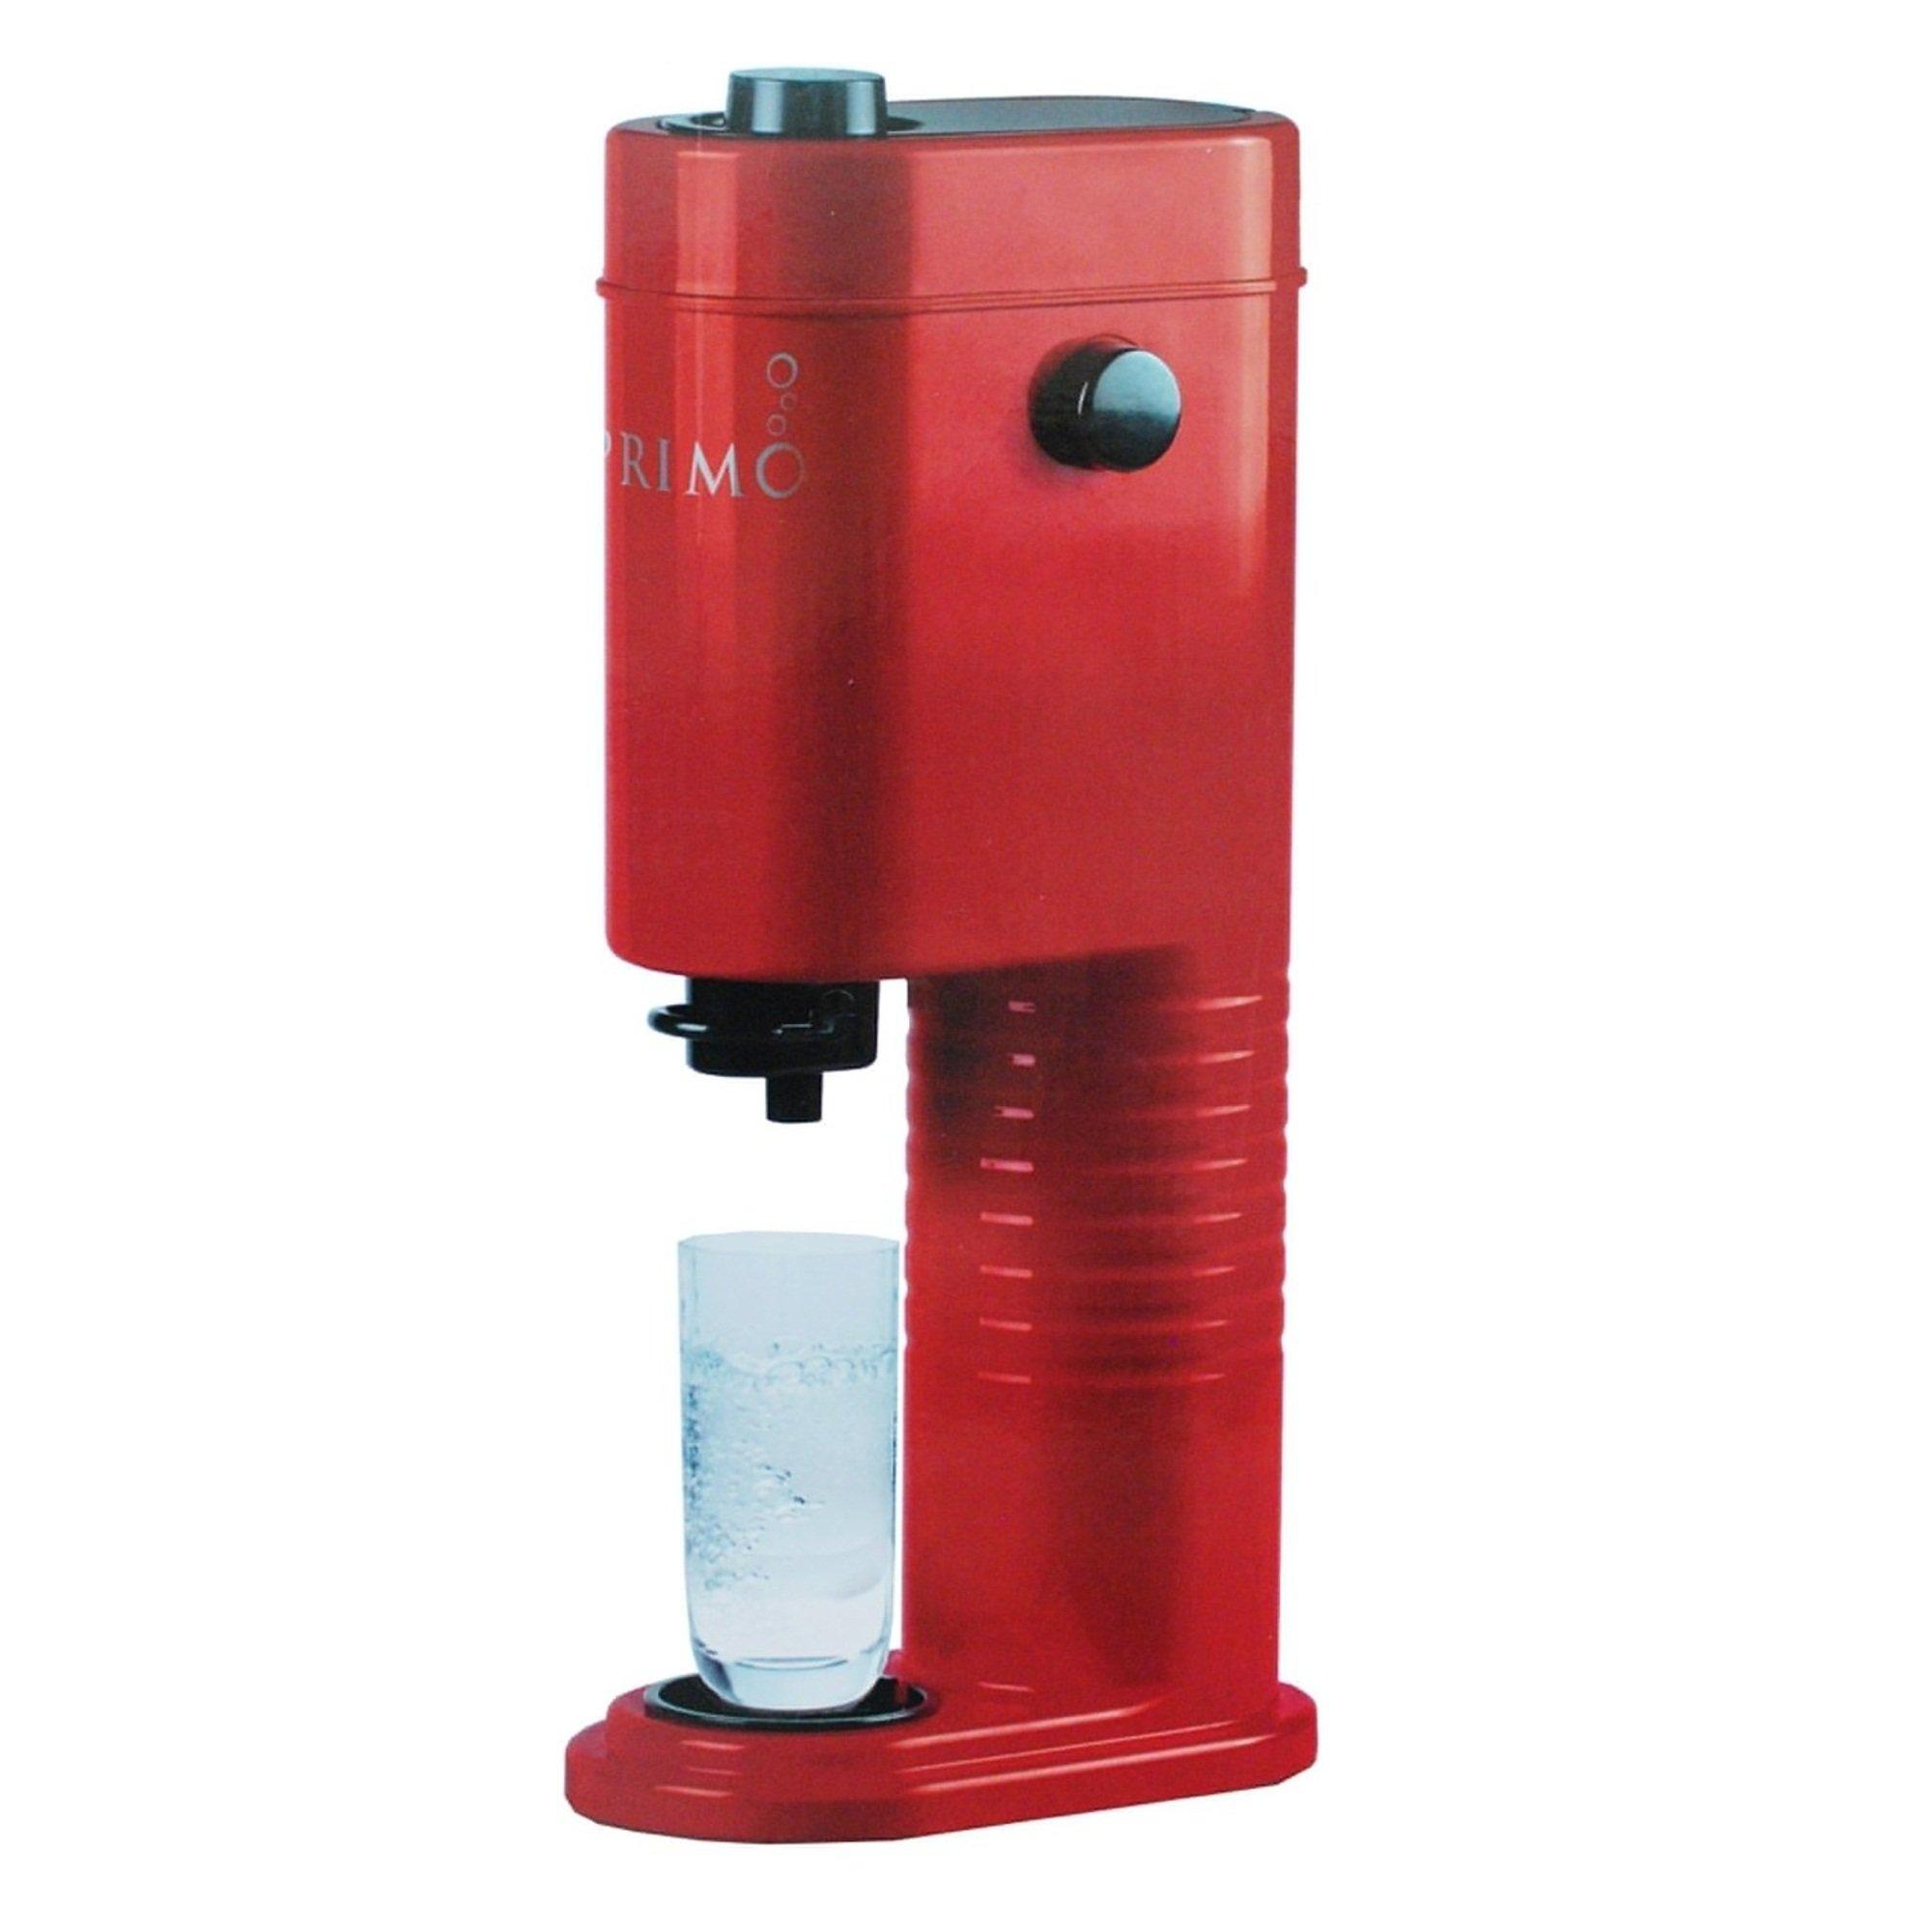 Primo Flavorstation Home Beverage Maker FSS Freedom 200 (Red) by Flavorstation